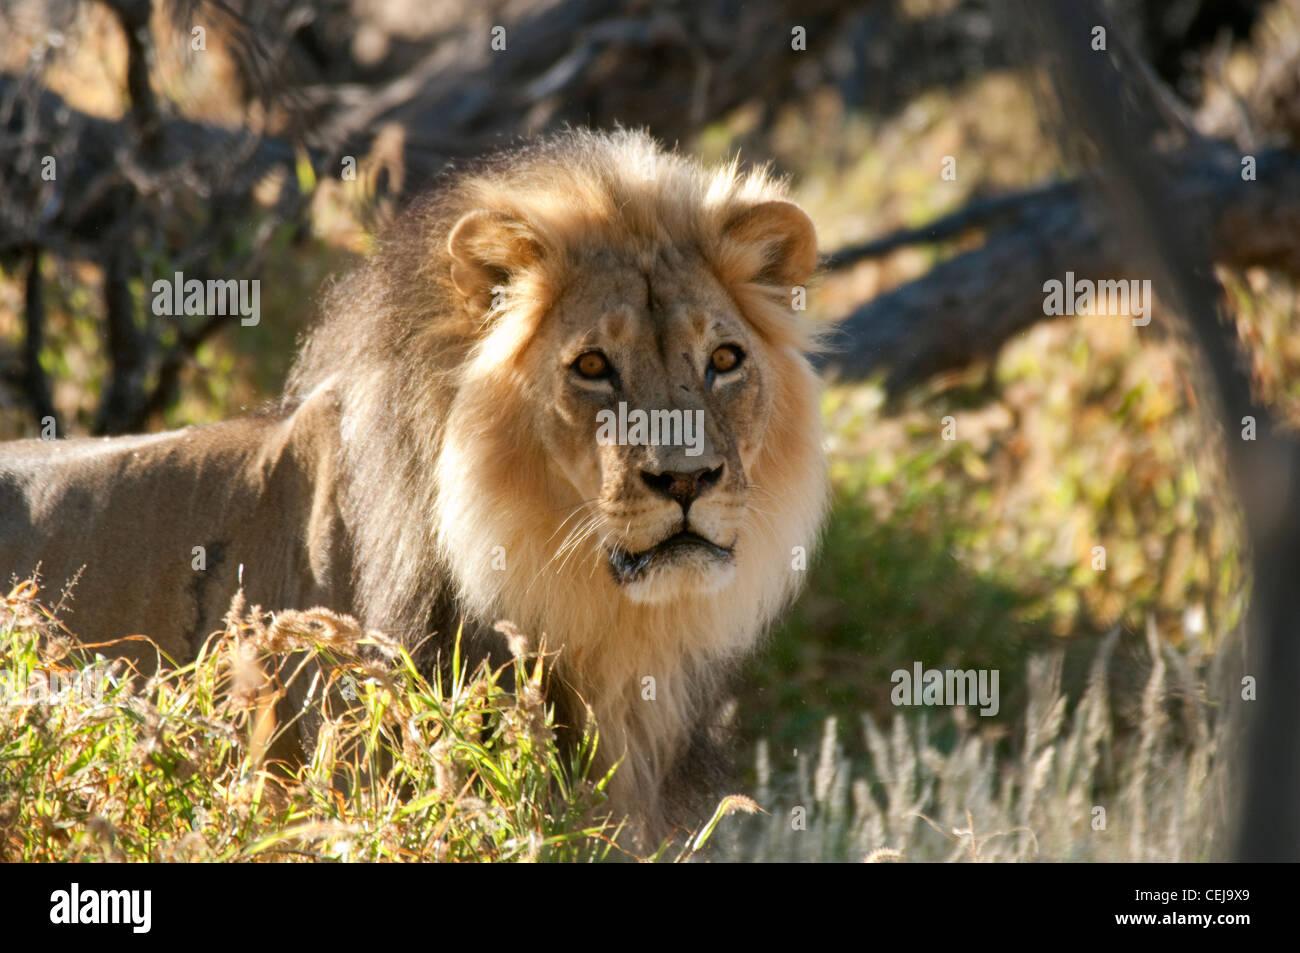 Lion near Xaus Lodge,Kgalagadi Transfrontier Park,Northern Cape - Stock Image